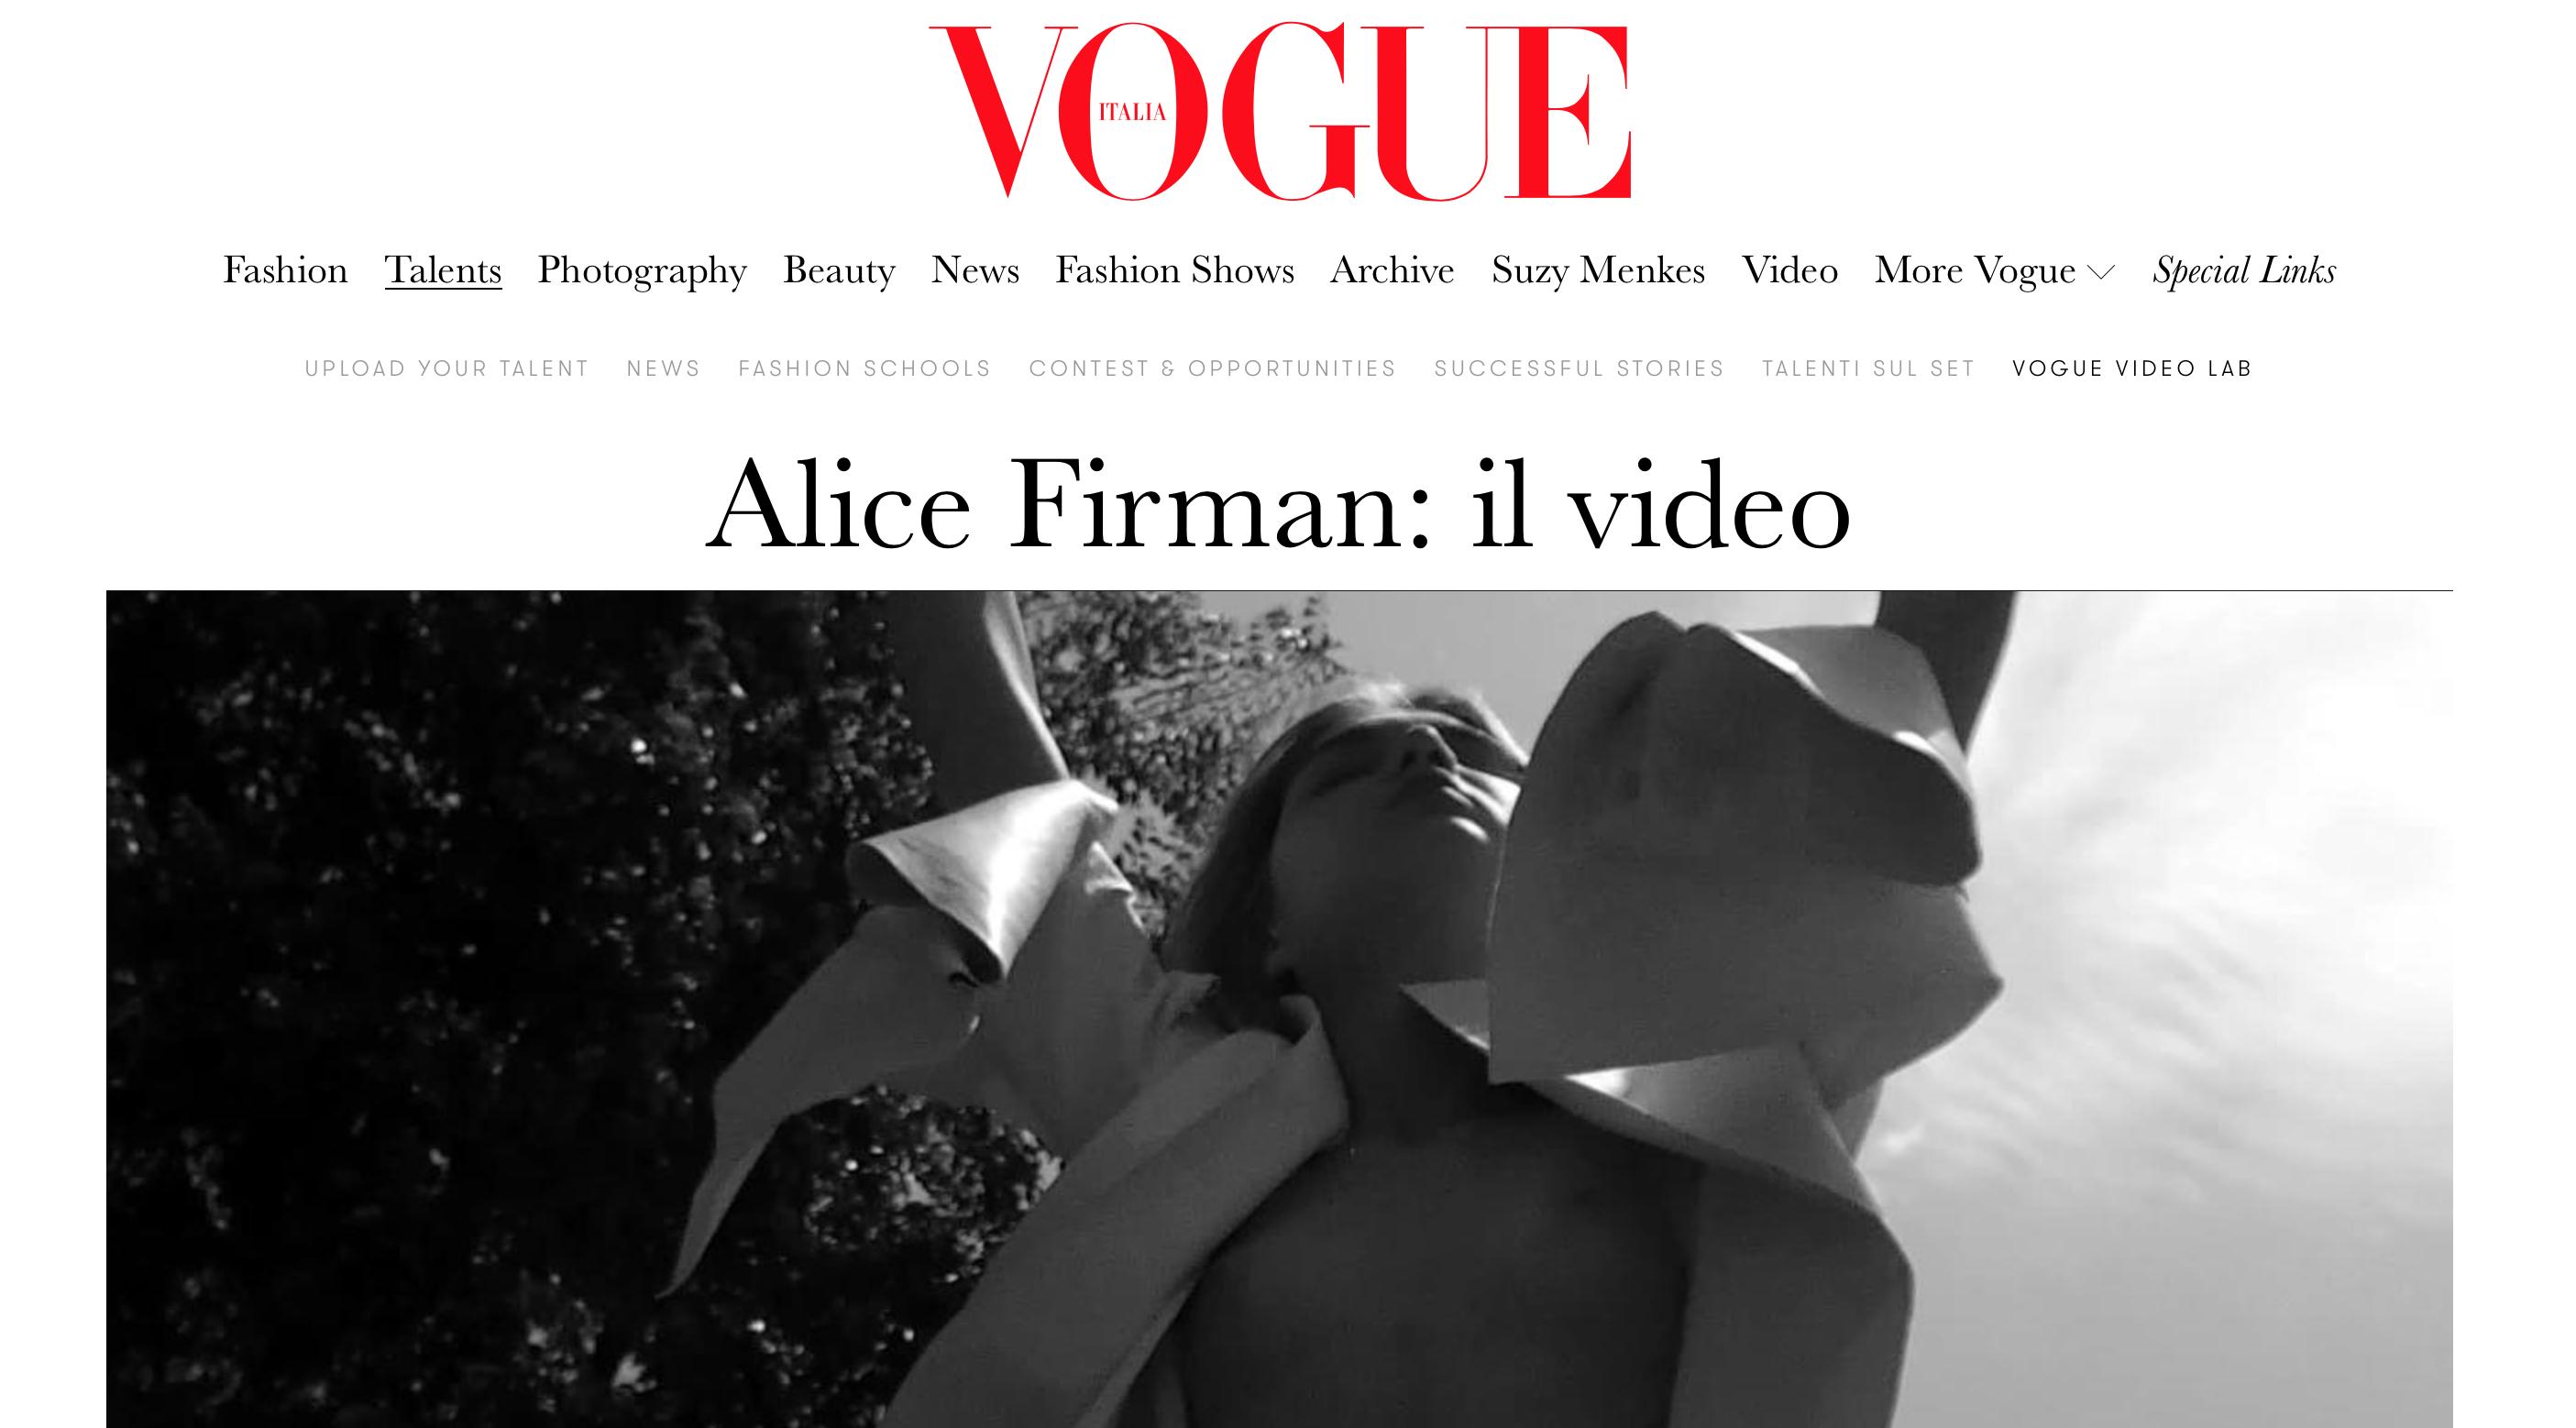 http://Vogue.it